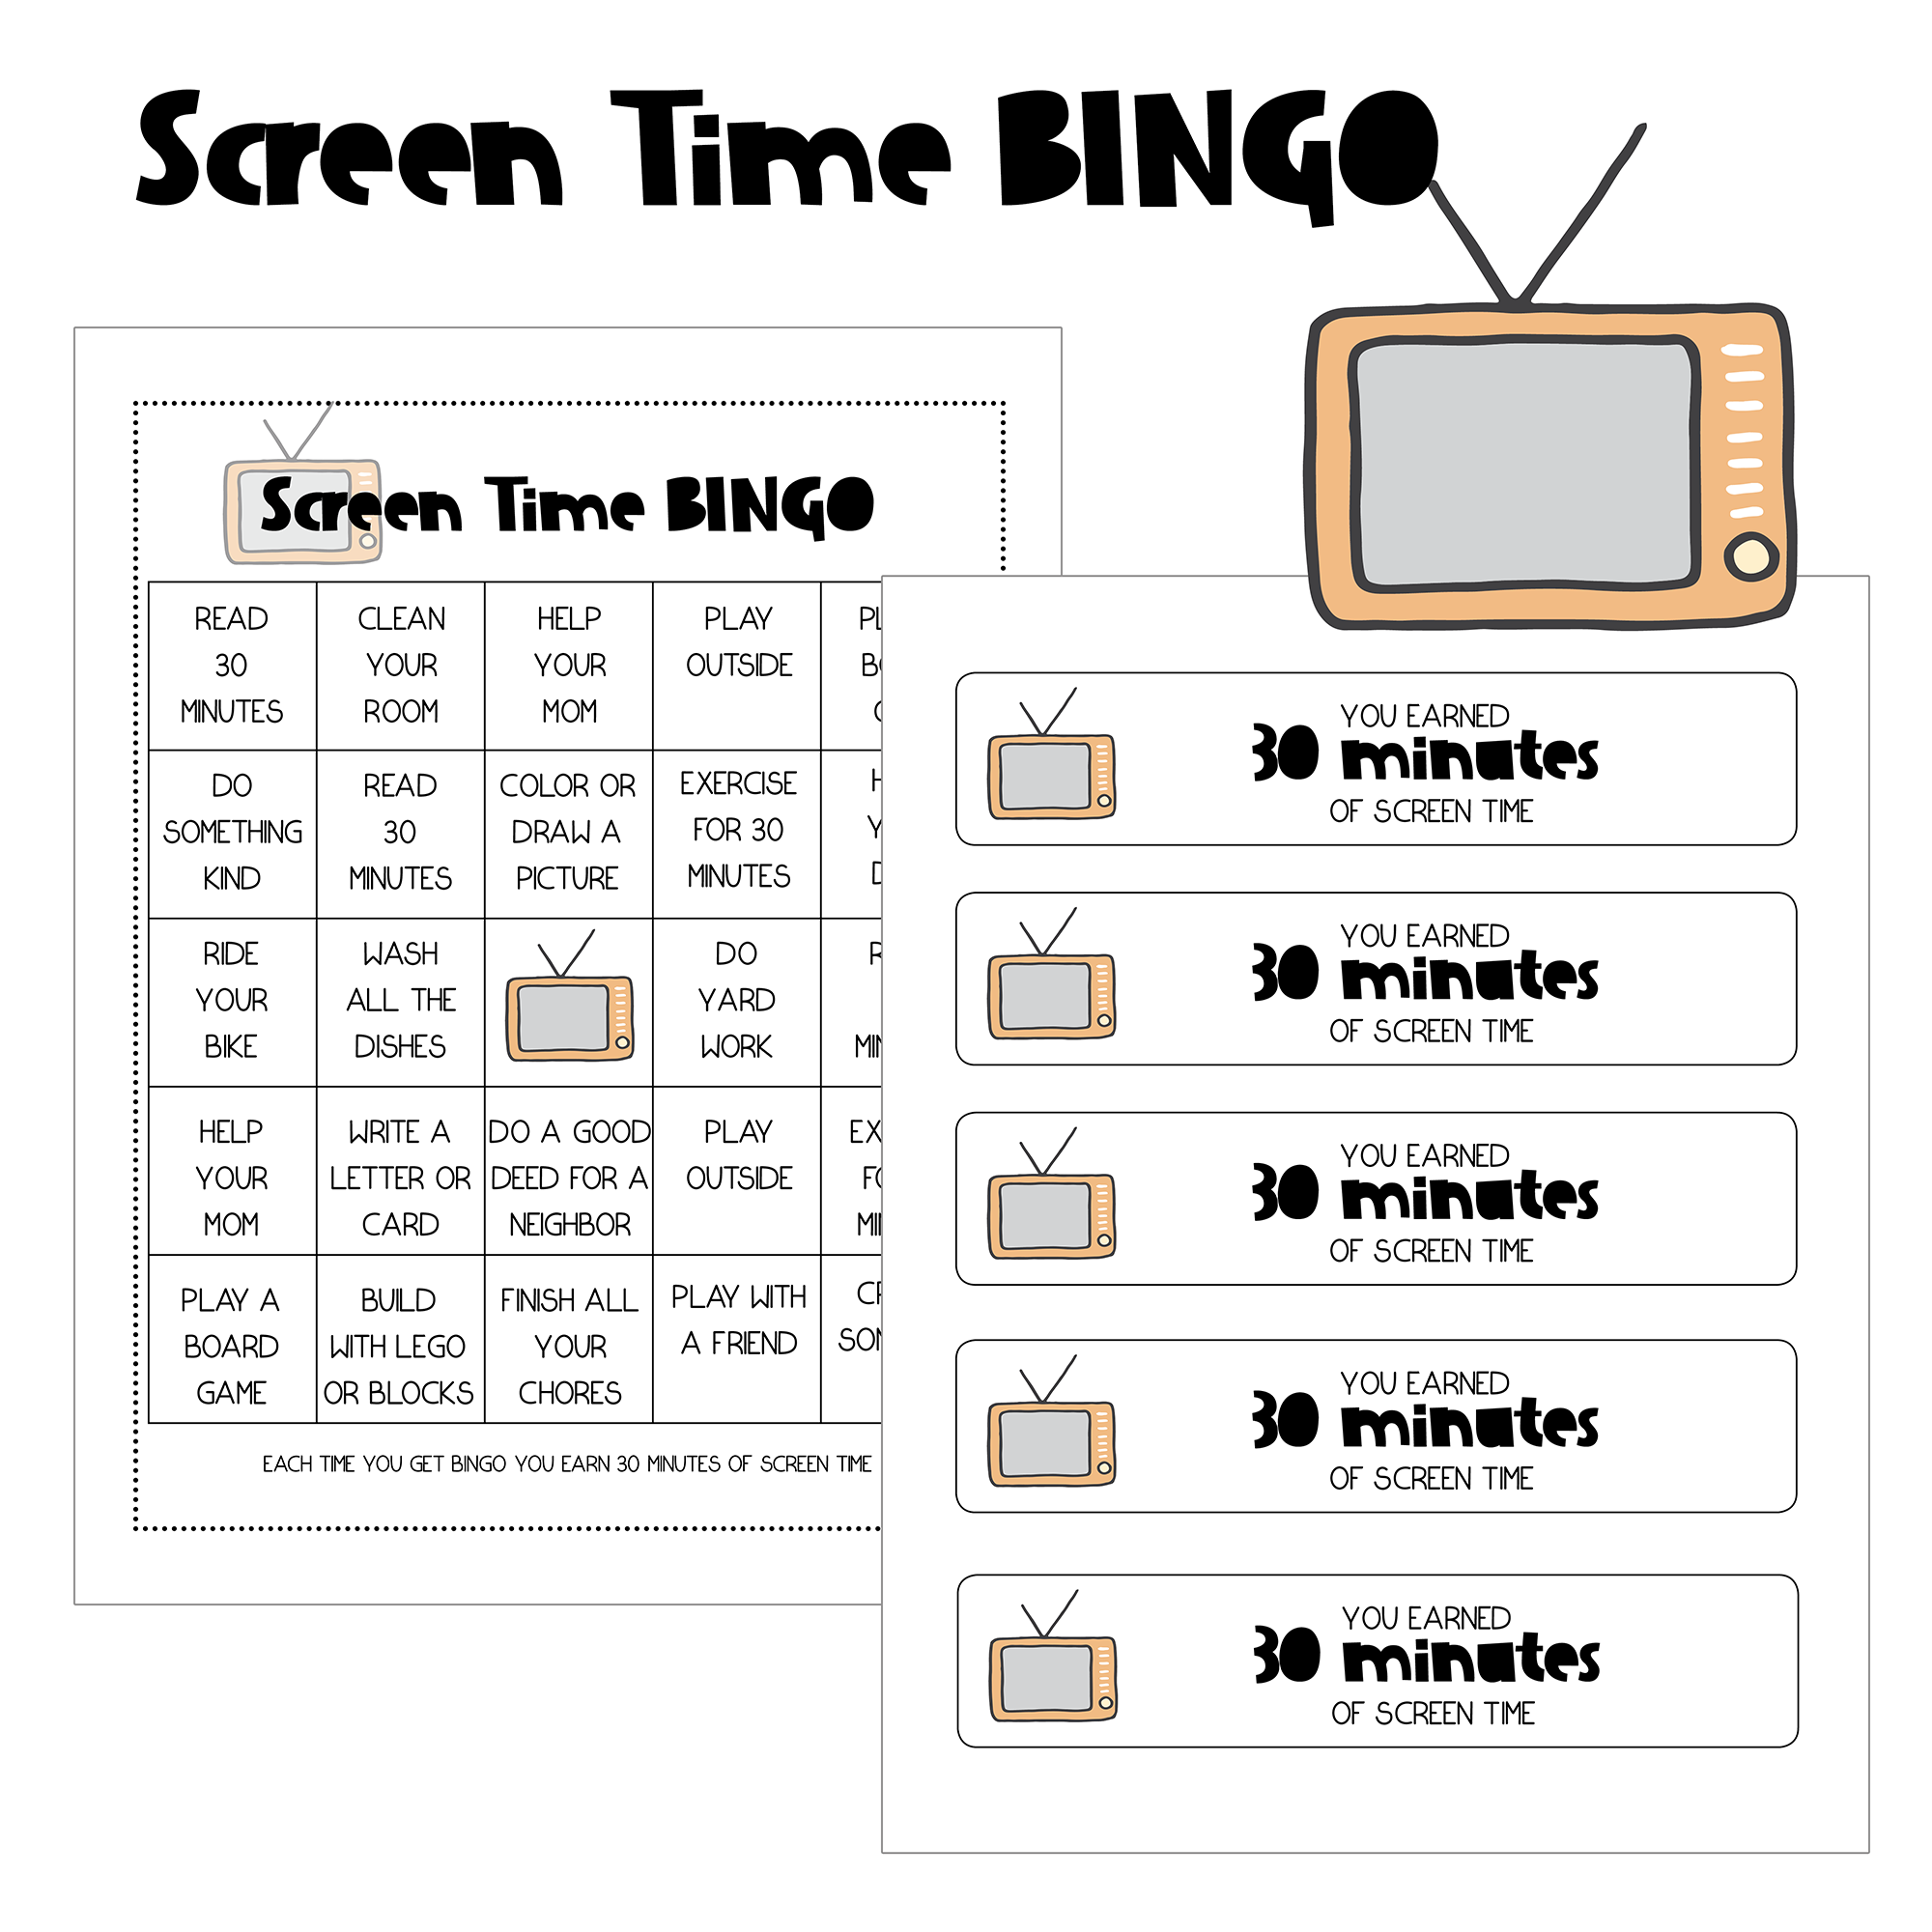 Free Printable Screen Time Bingo Game For Teaching Responsibility